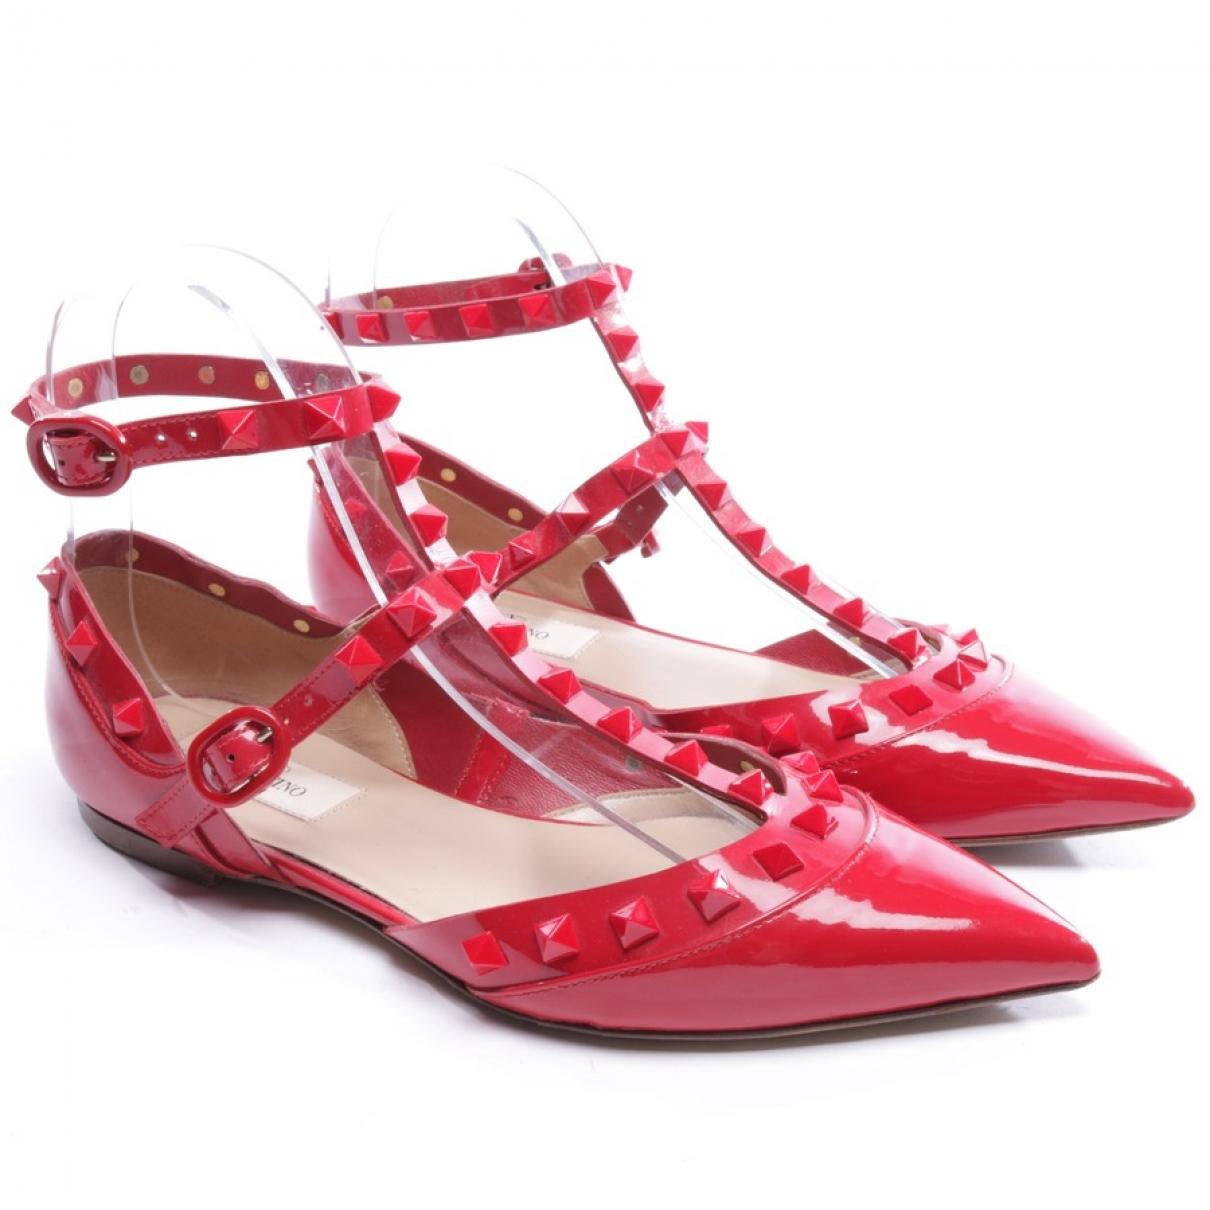 Valentino Garavani \N Red Patent leather Ballet flats for Women 36 EU